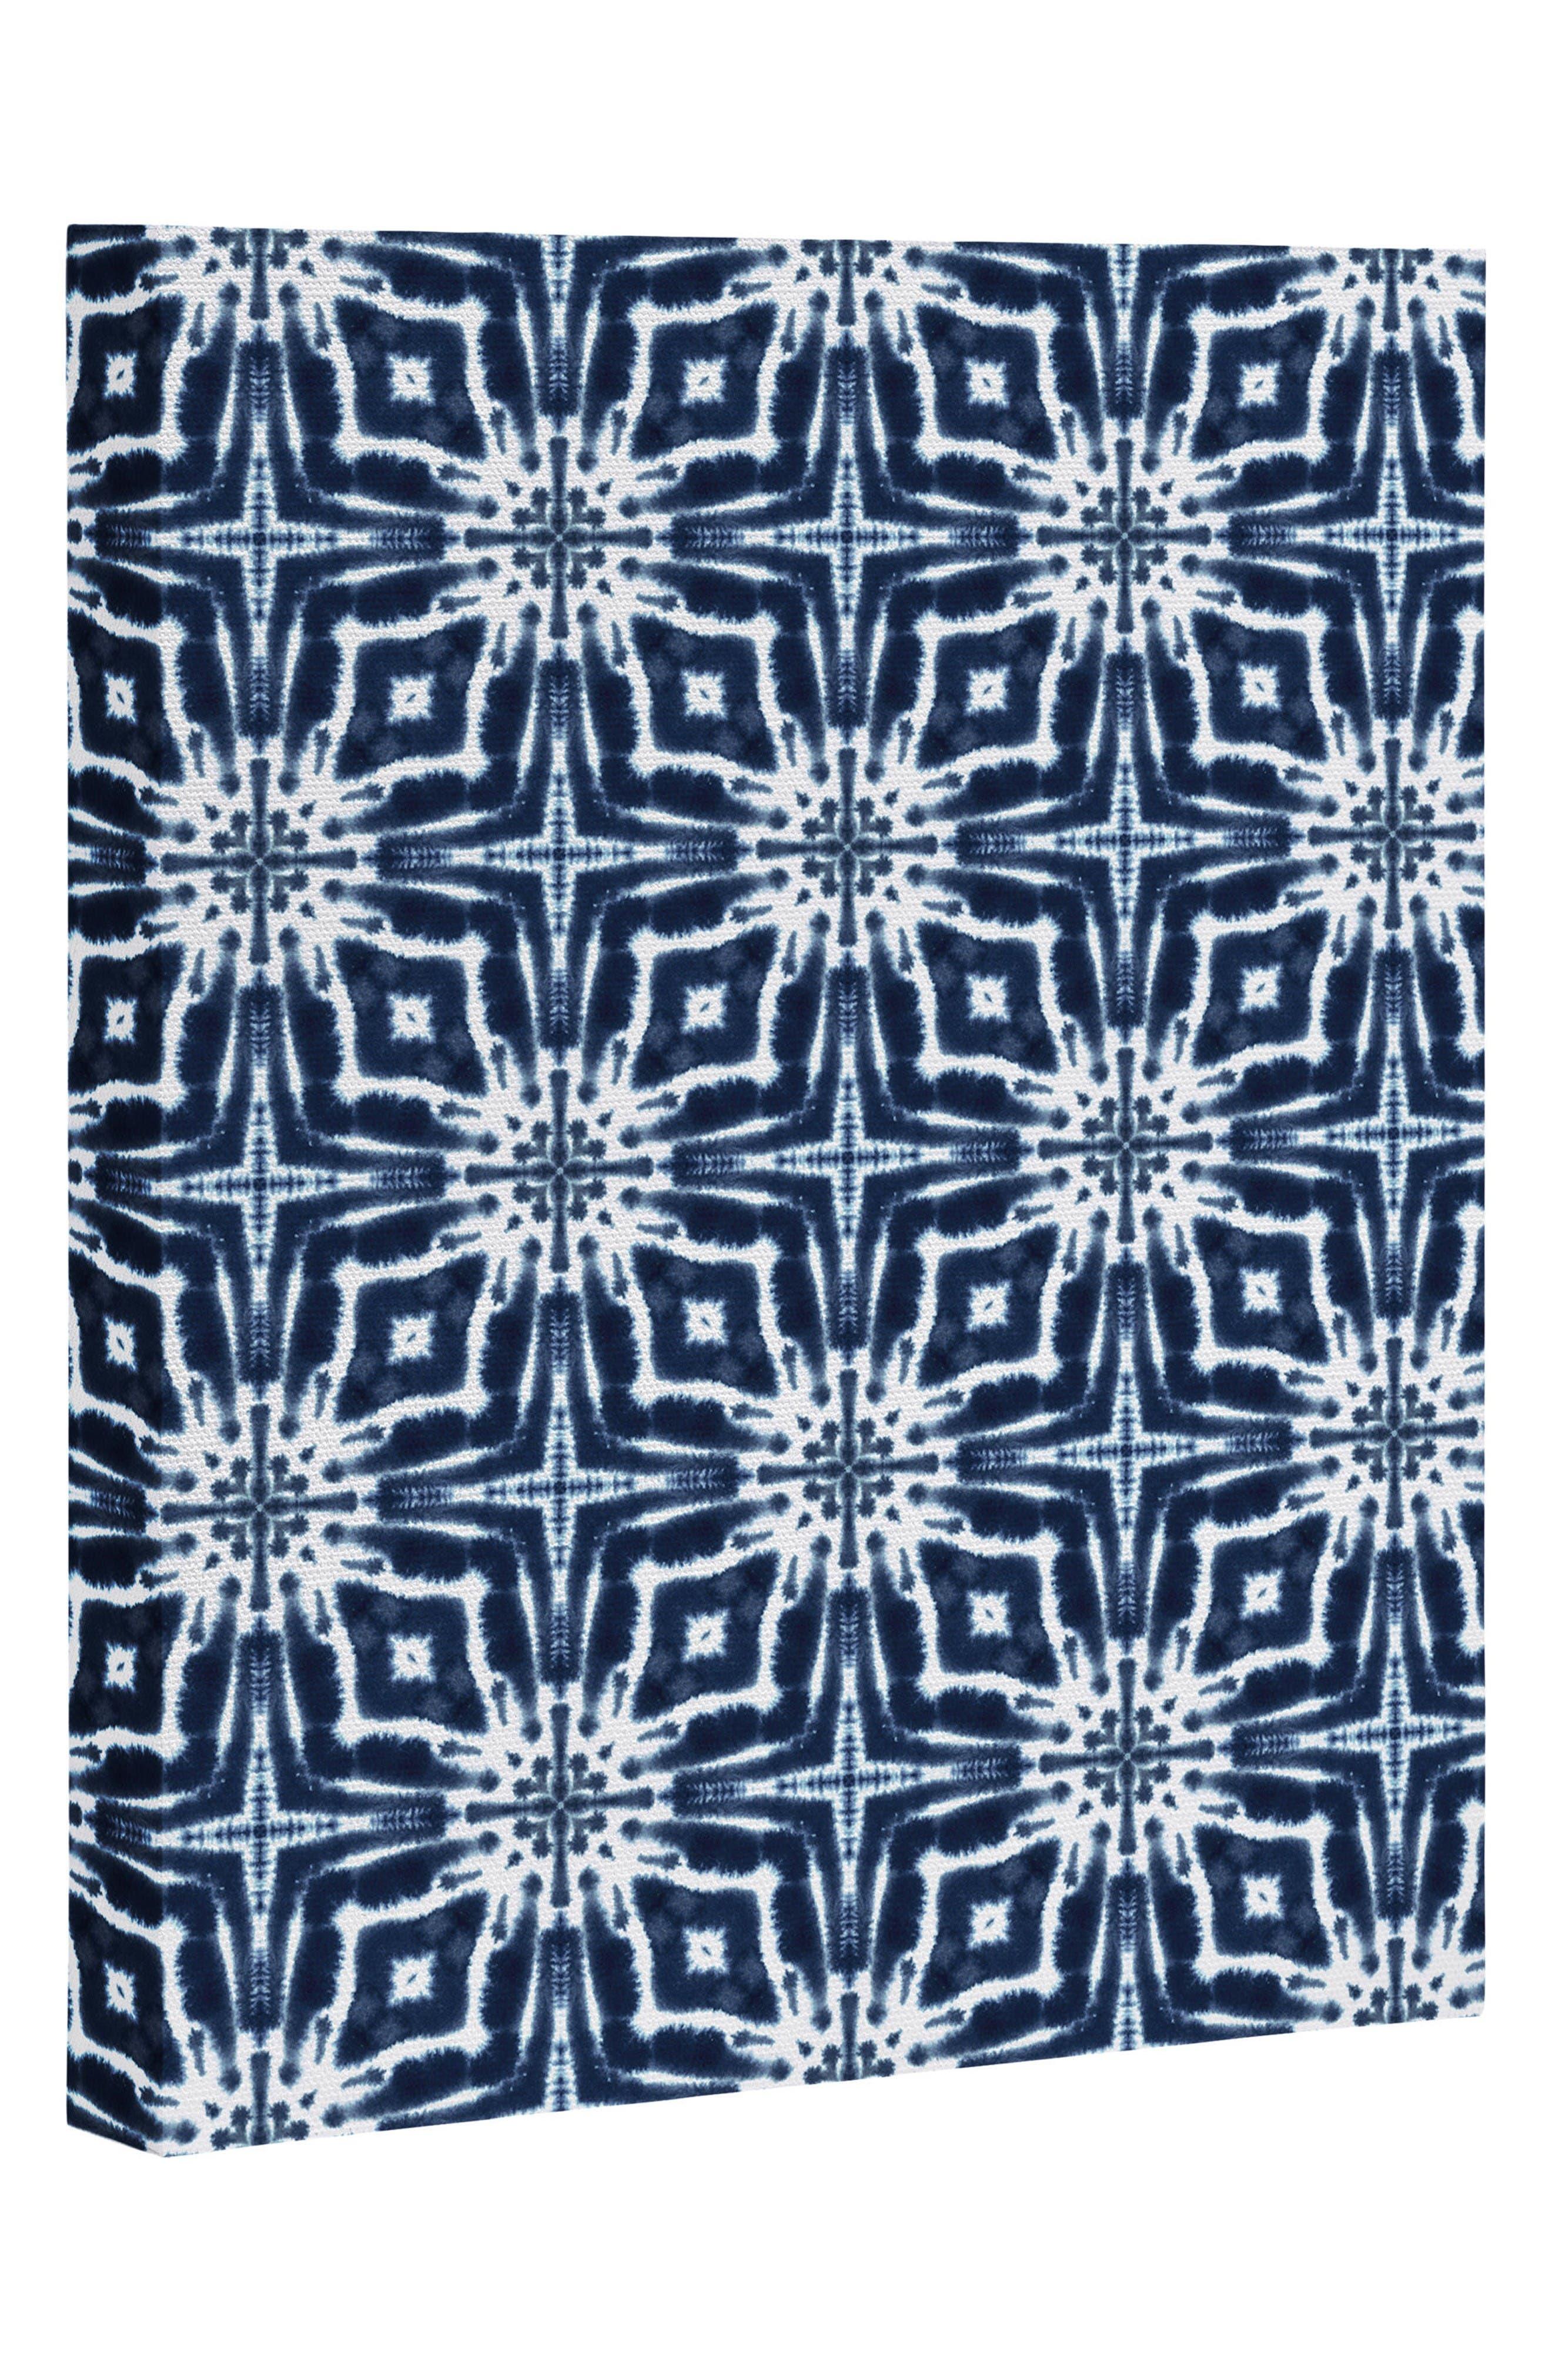 Alternate Image 1 Selected - Deny Designs Indigo Canvas Print